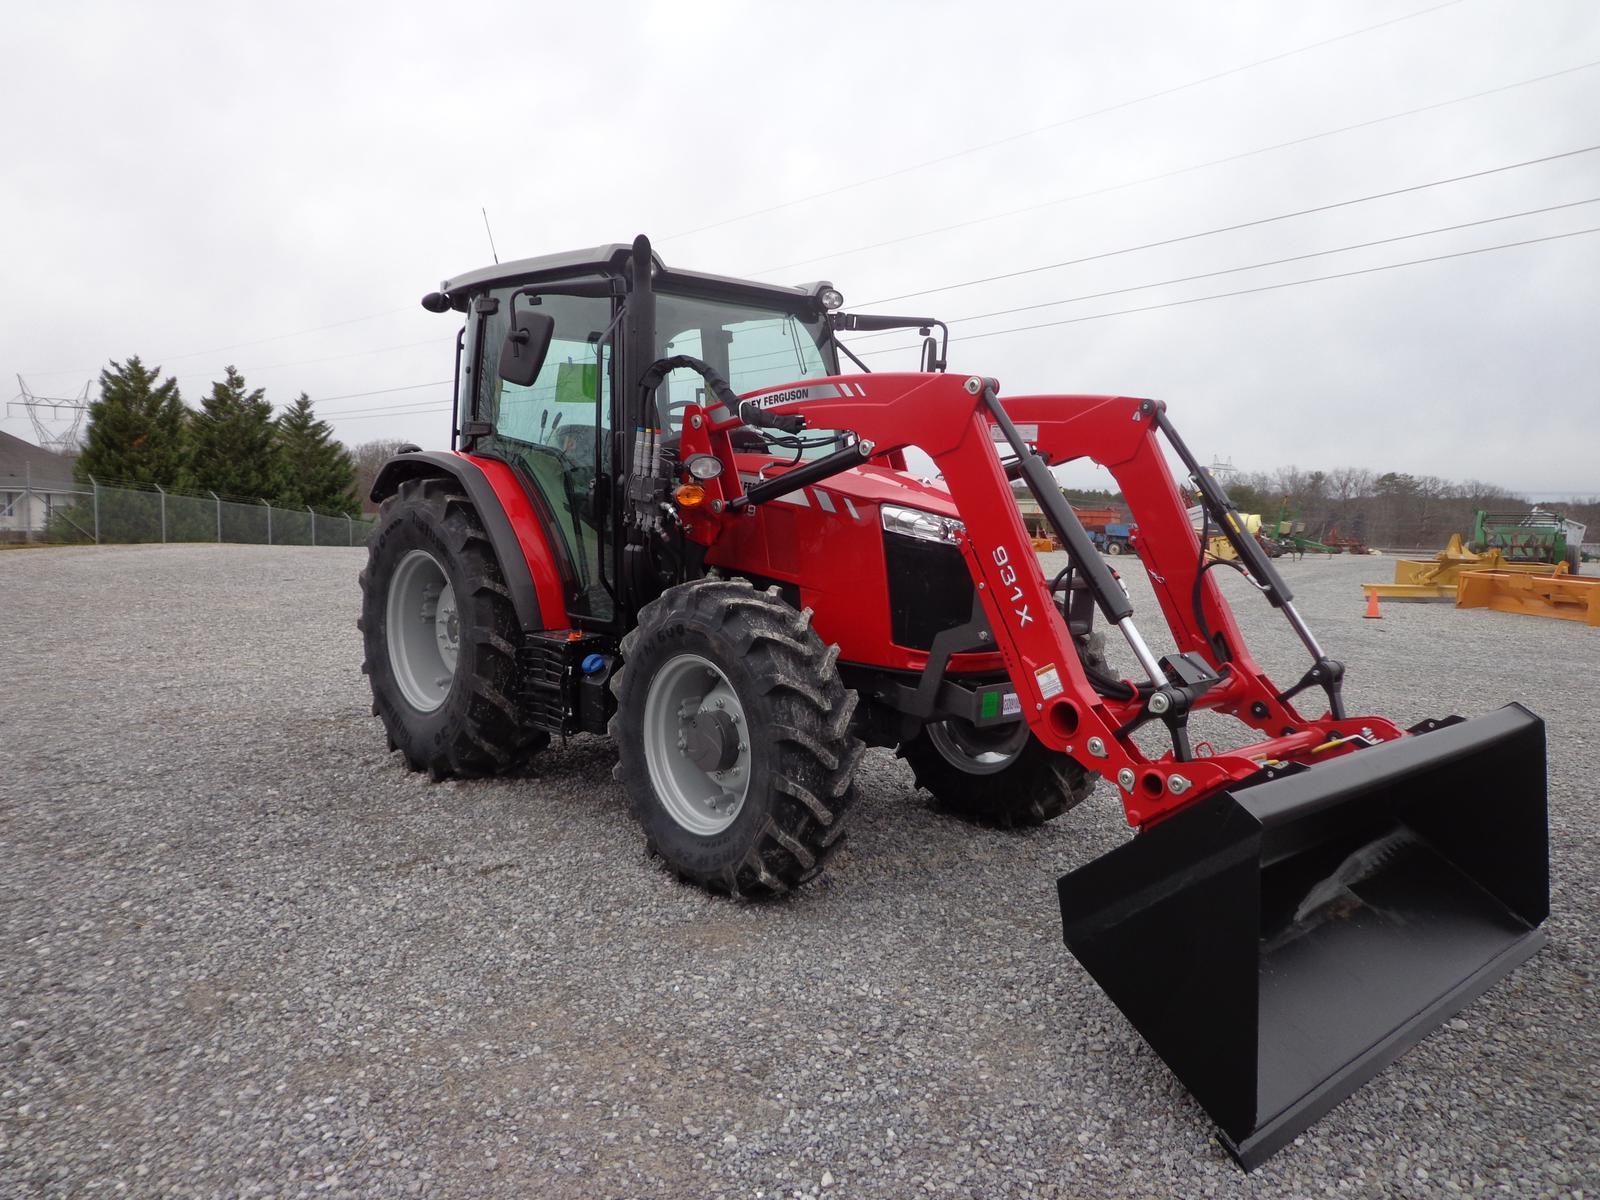 Tractors from Massey Ferguson Tyler Brothers Farm Equipment